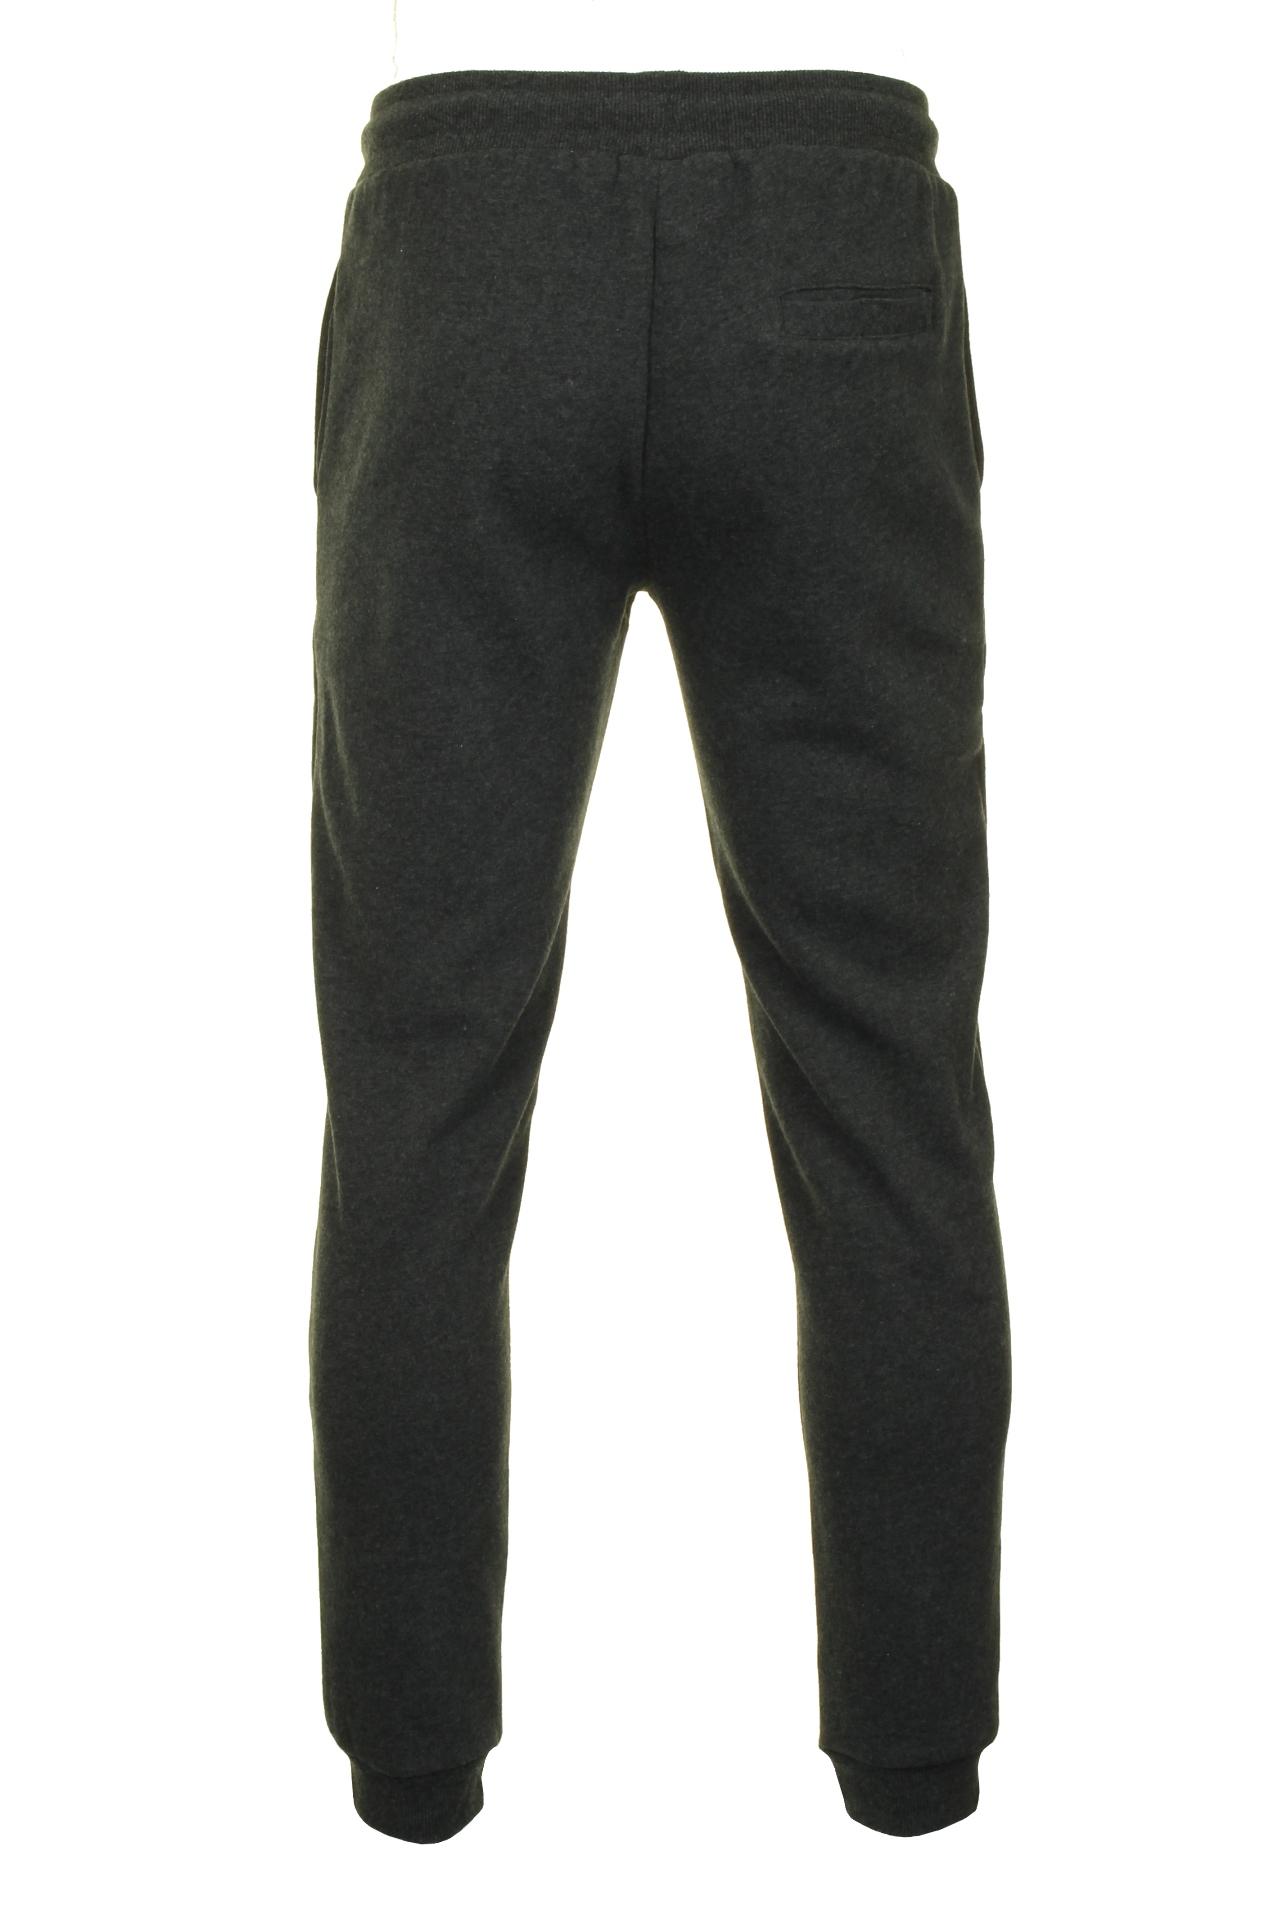 Ellesse-Da-Uomo-Pantaloni-Sportivi-Jog-Pantaloni-con-logo-034-Ovest-034 miniatura 8